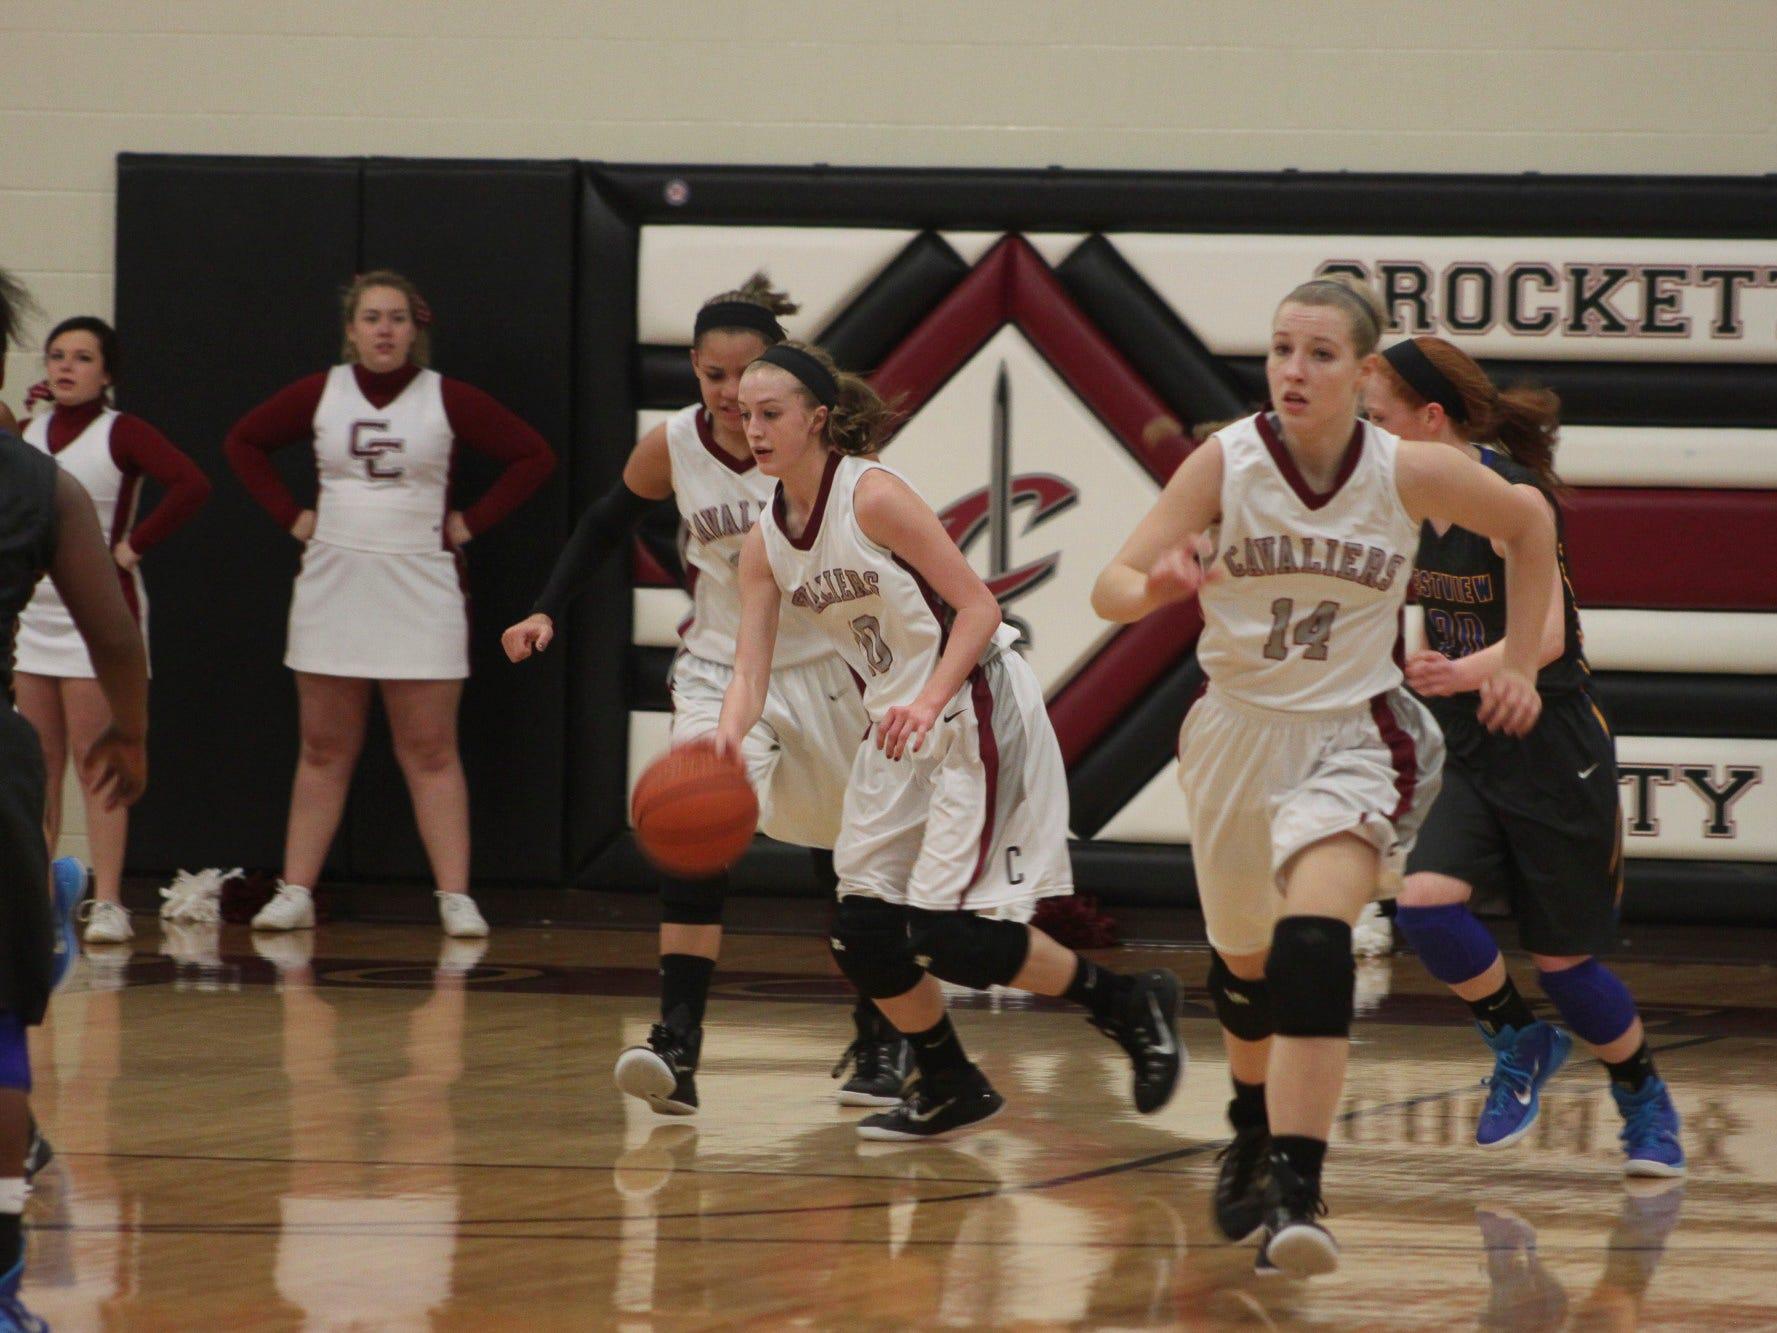 Elli Pratt, shown with the ball, has helped Crockett County's girls during a landmark season.